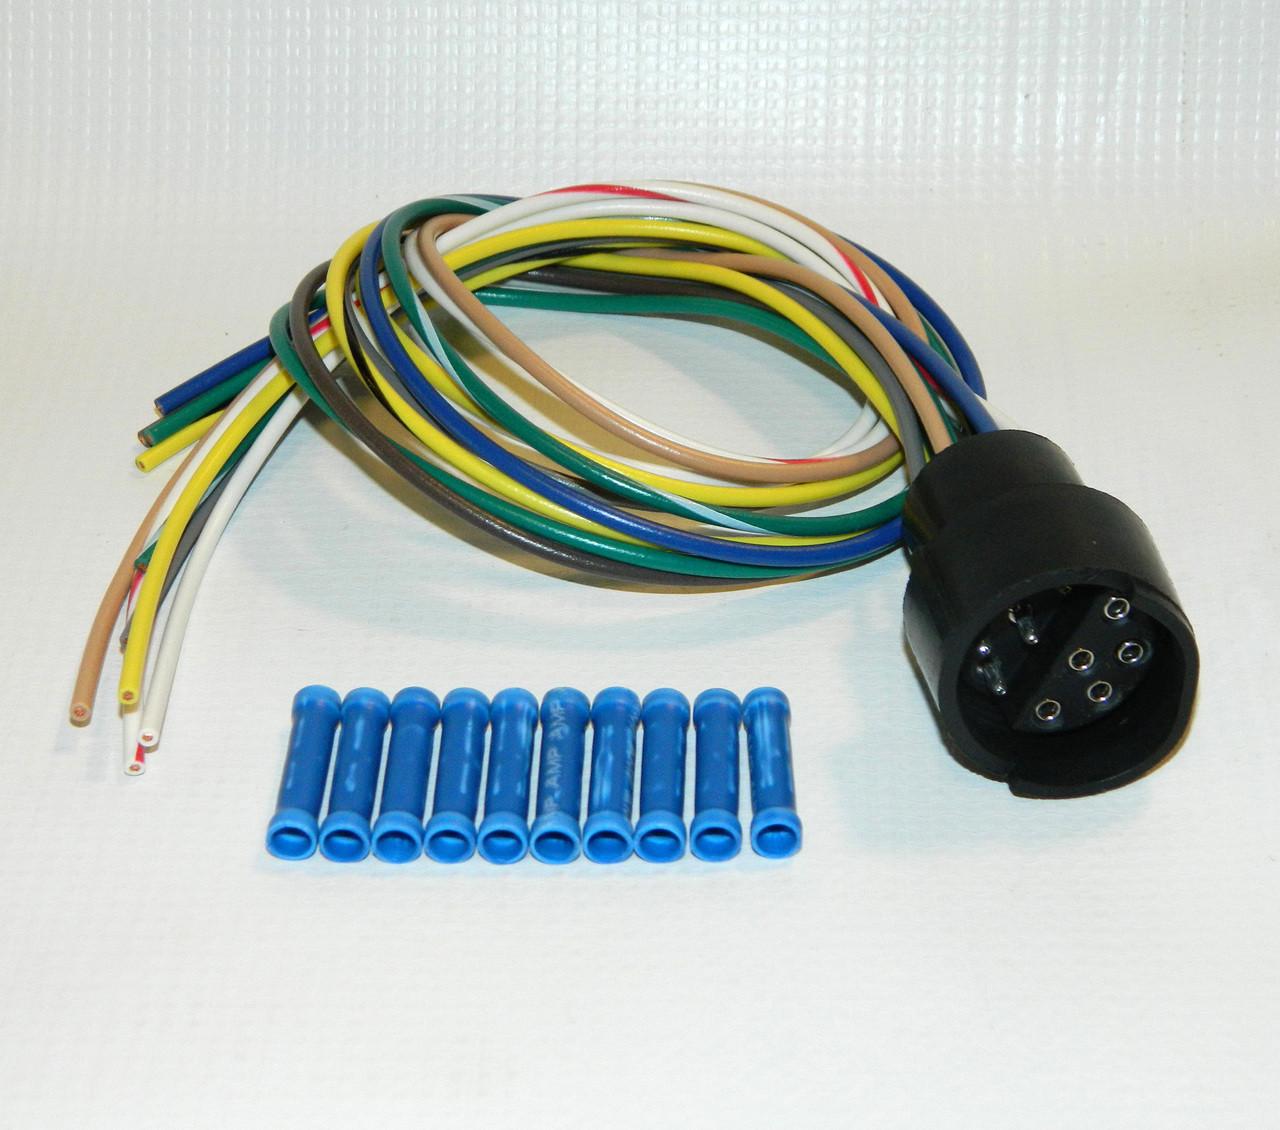 hn38813075 hiniker plow side 10 pin pigtail repair kit croft trailer supply [ 1280 x 1130 Pixel ]